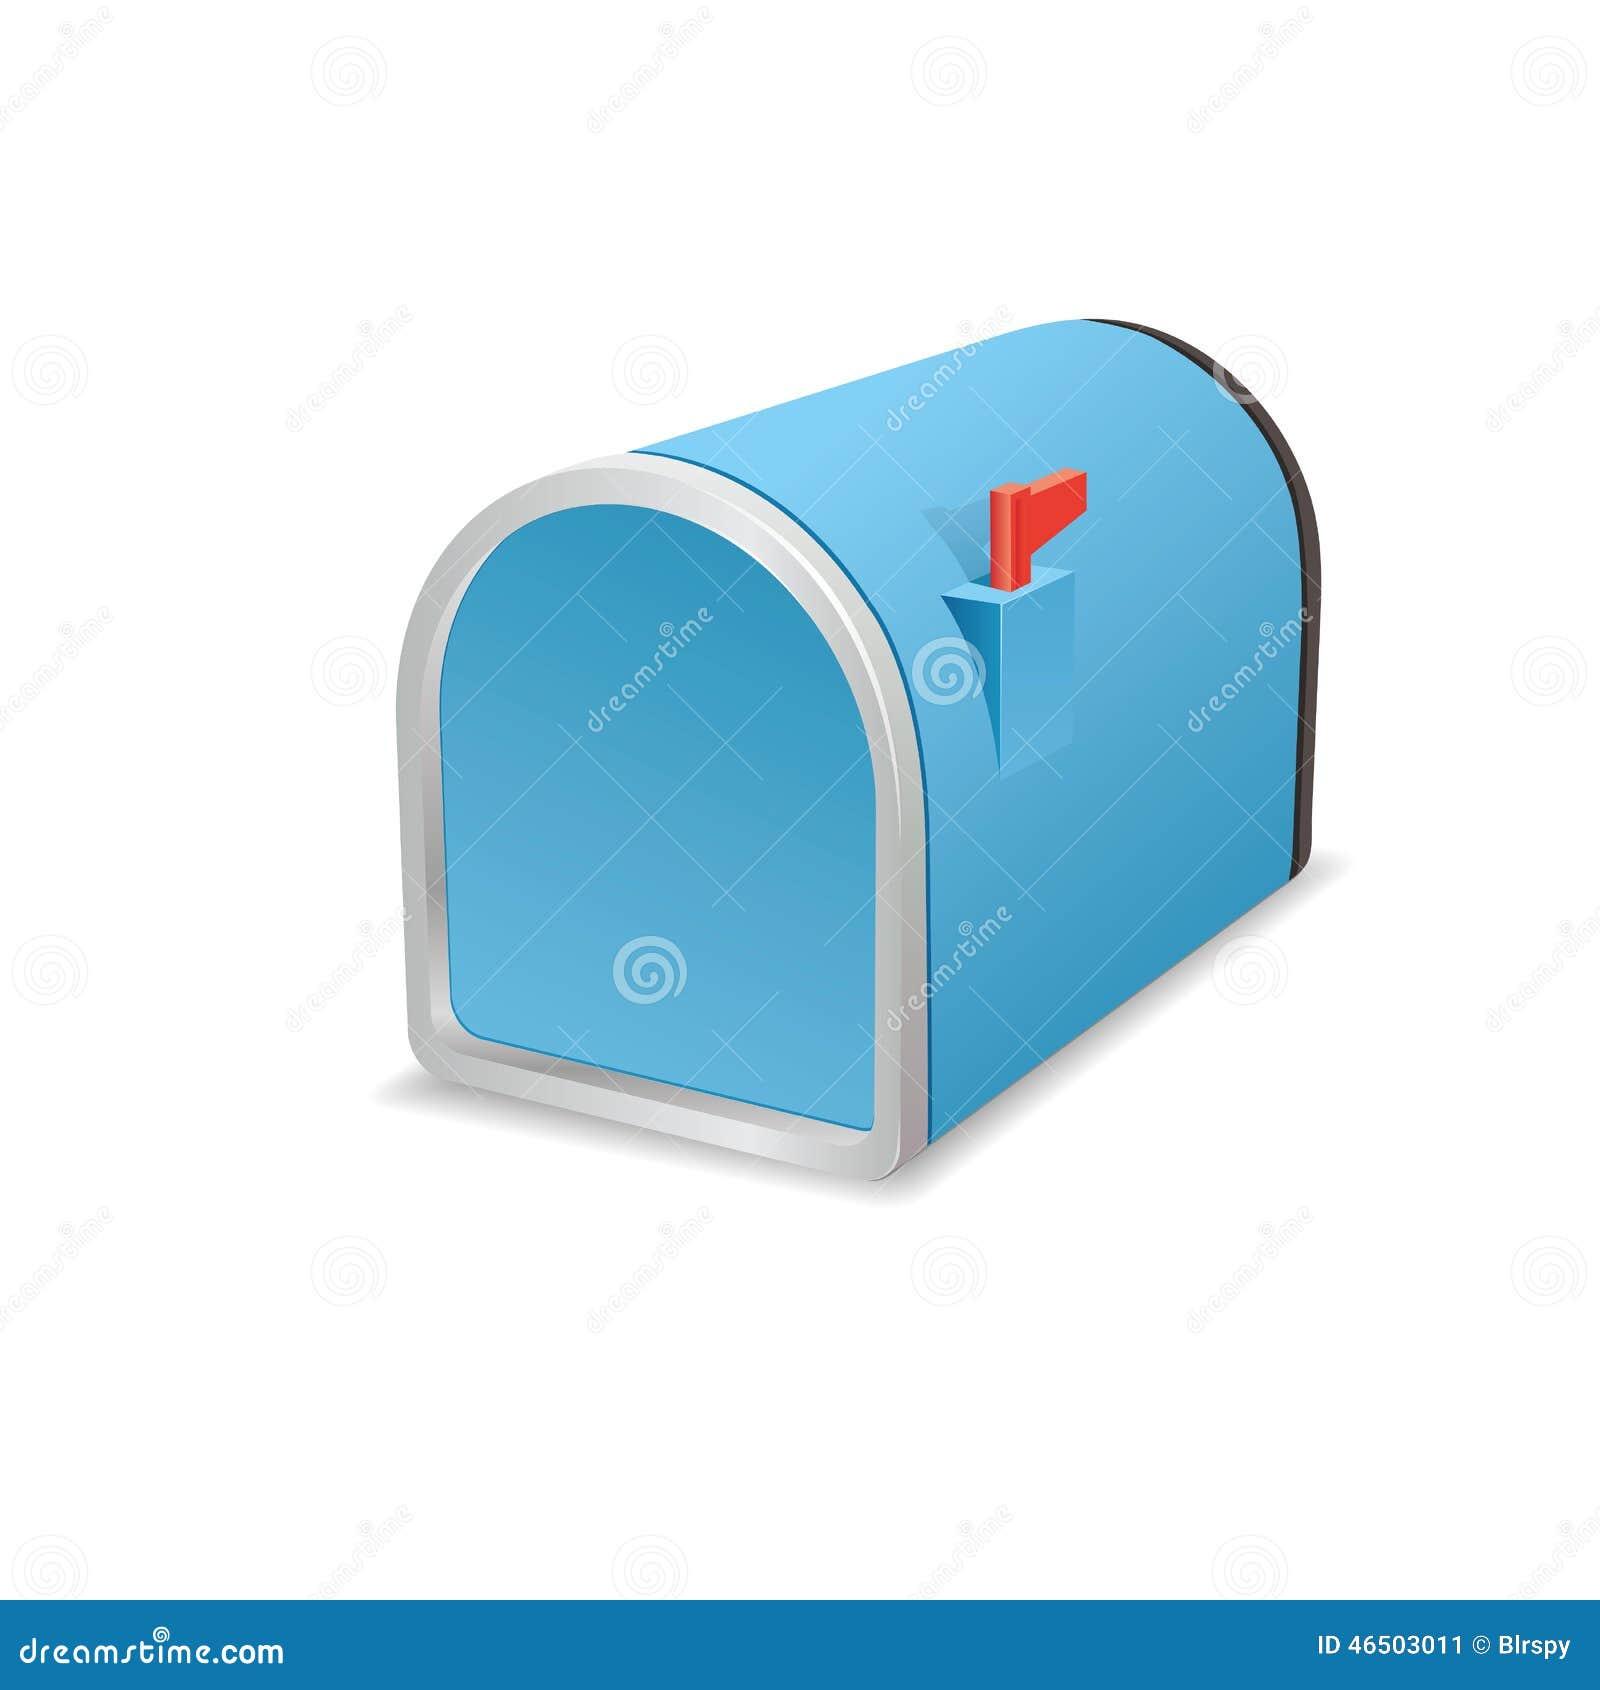 closed mailbox. Beautiful Blue Metallic Closed Mailbox. Mailbox U